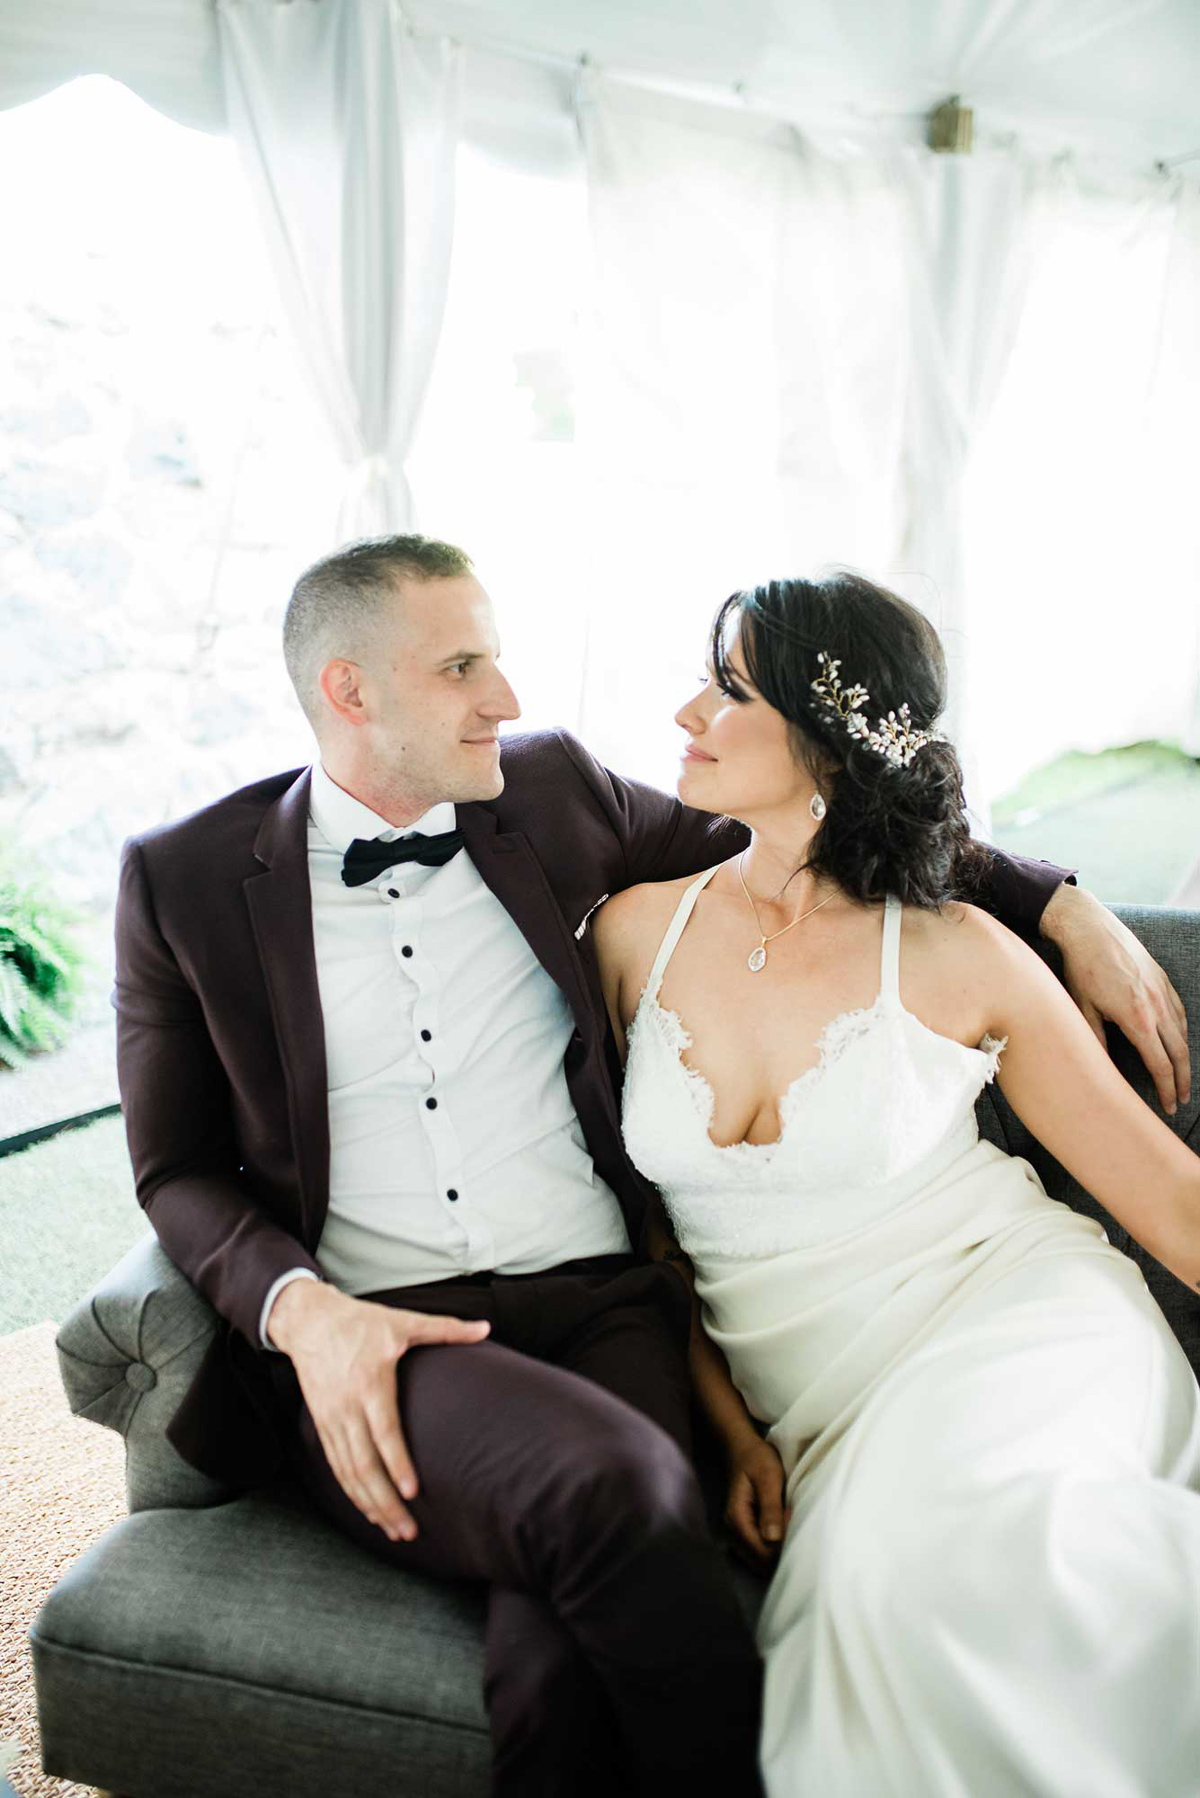 destiny-dawn-photography-vineyard-bride-swish-list-knollwood-golf-and-country-club-ancaster-wedding-editorial-33.jpg